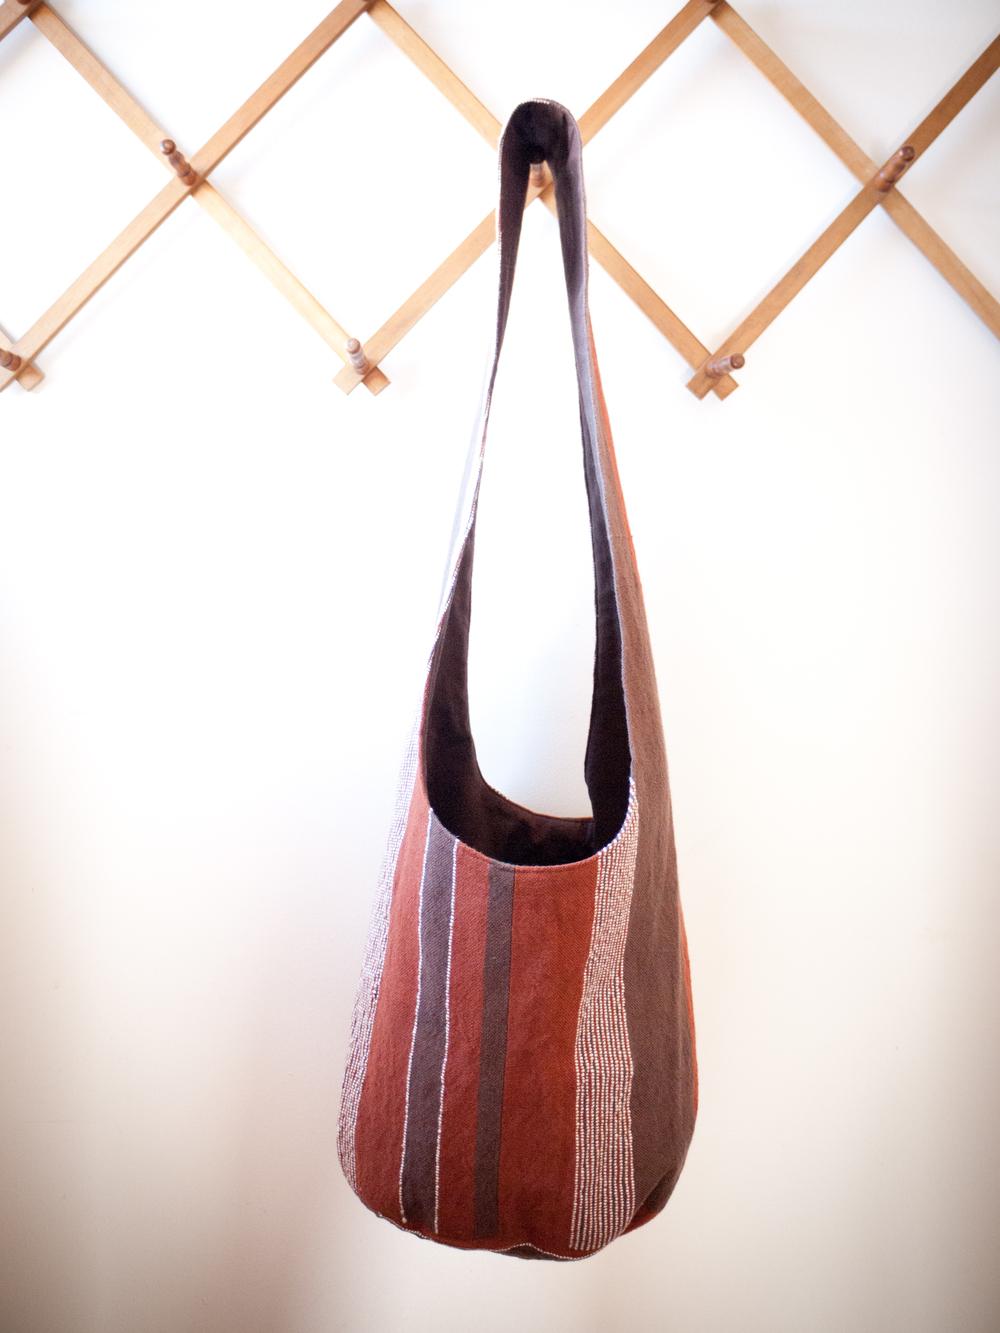 ingc bags-1 copy.jpg